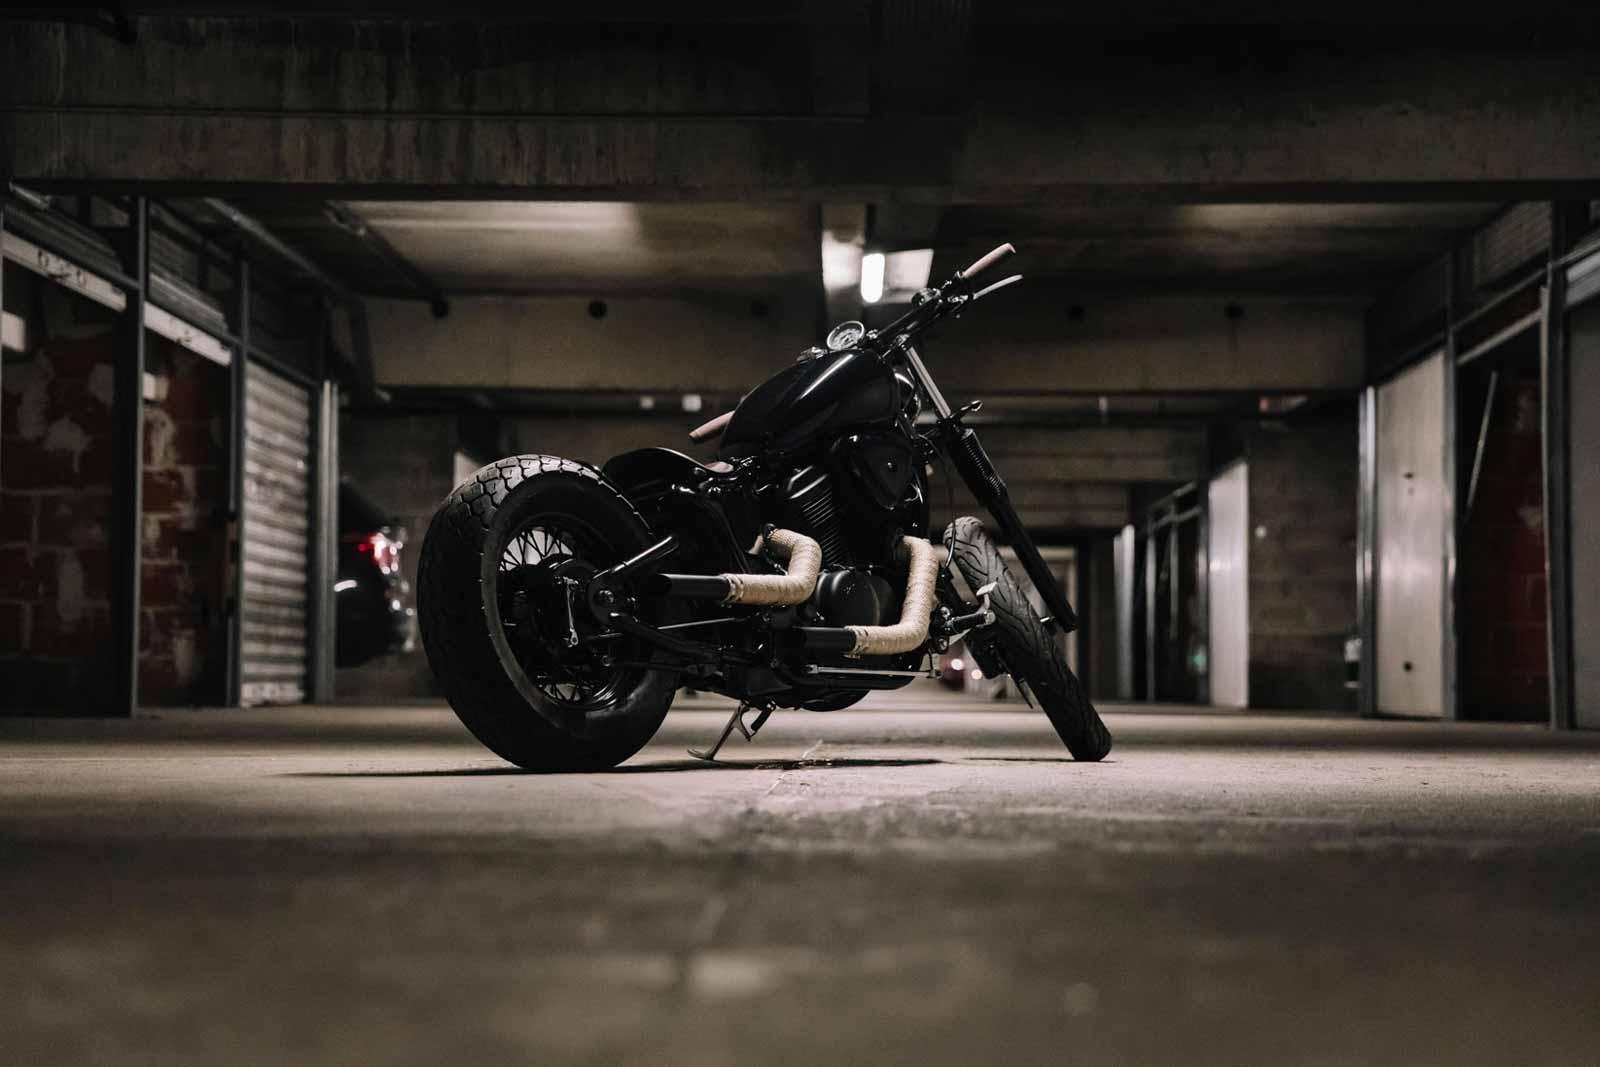 600 VT Shadow